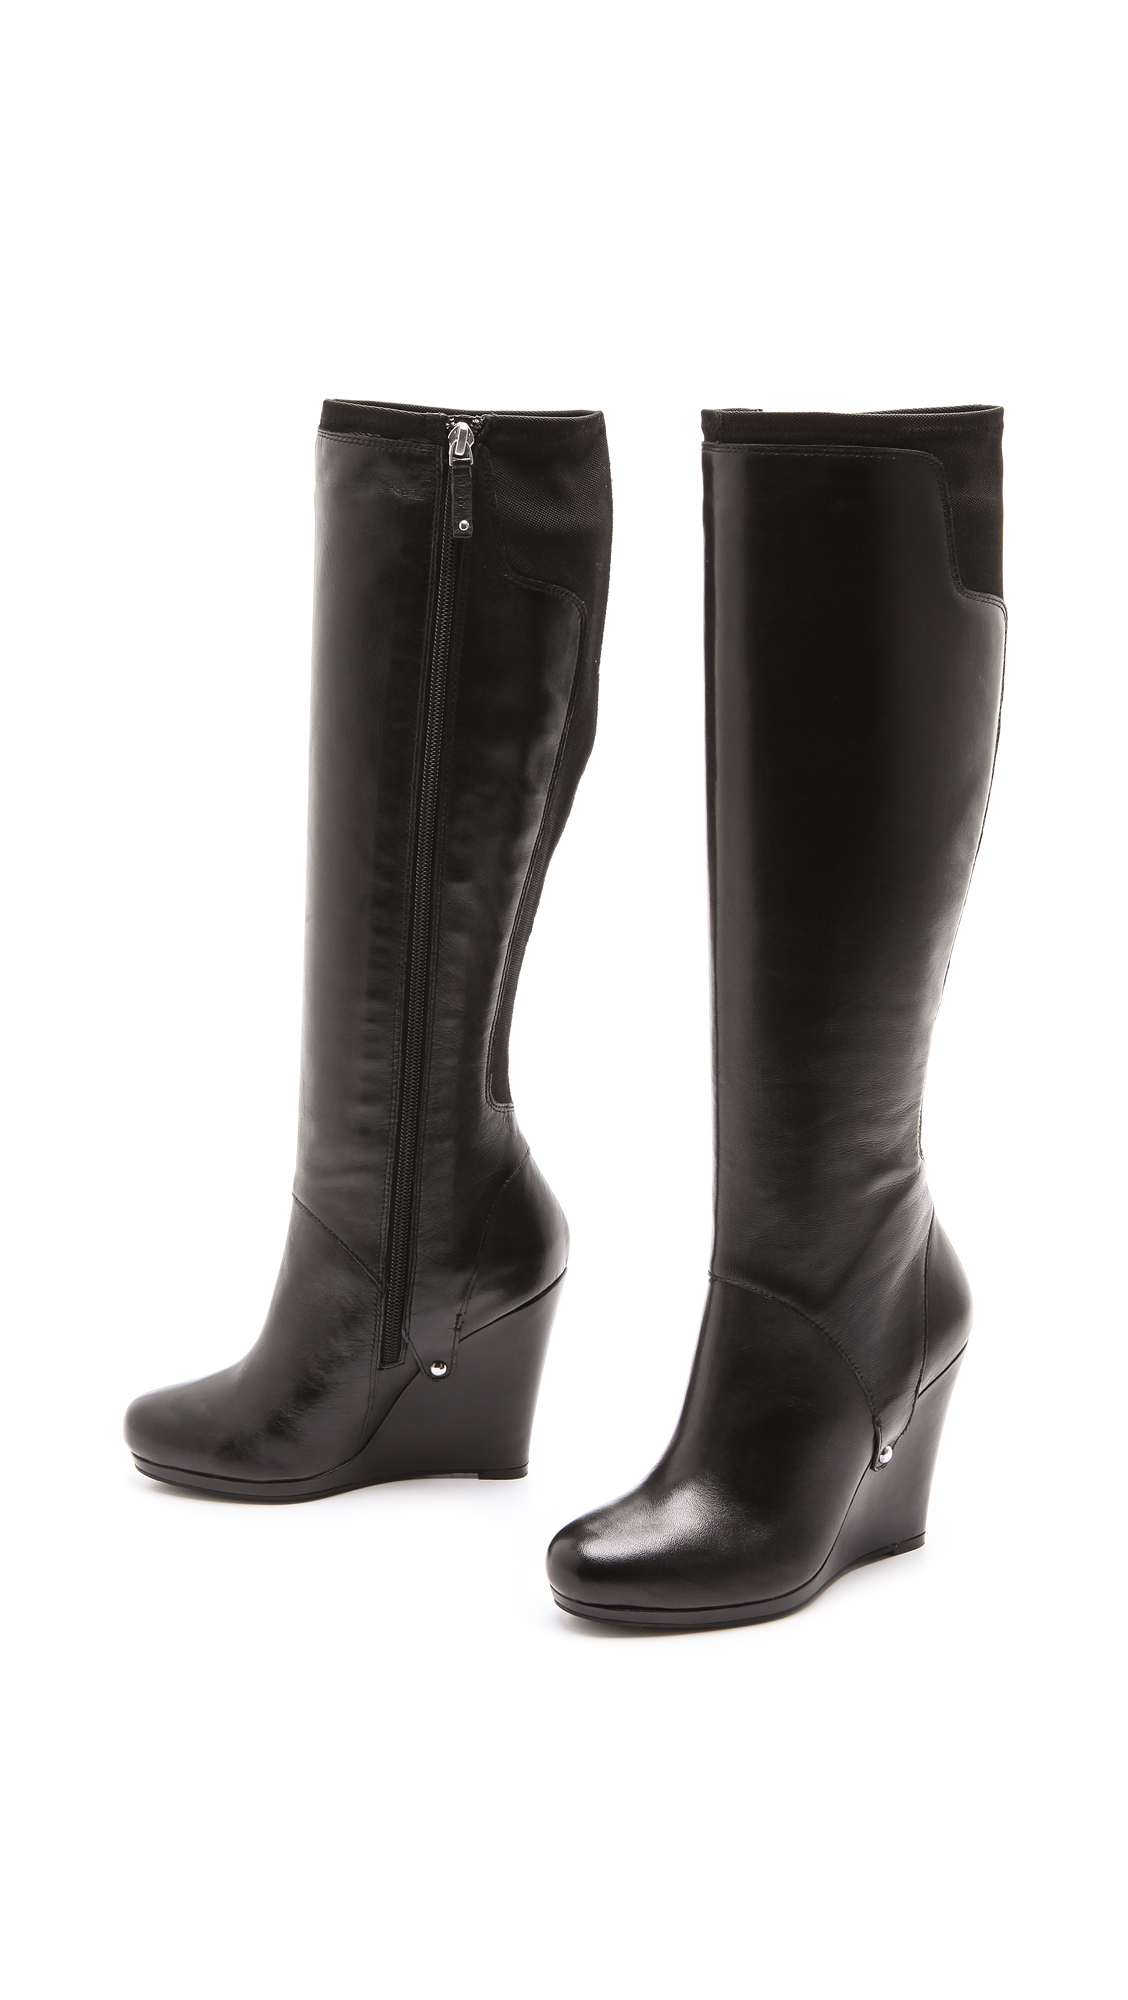 27bd7cfce52 DKNY Nadia Stretch Back Wedge Boots